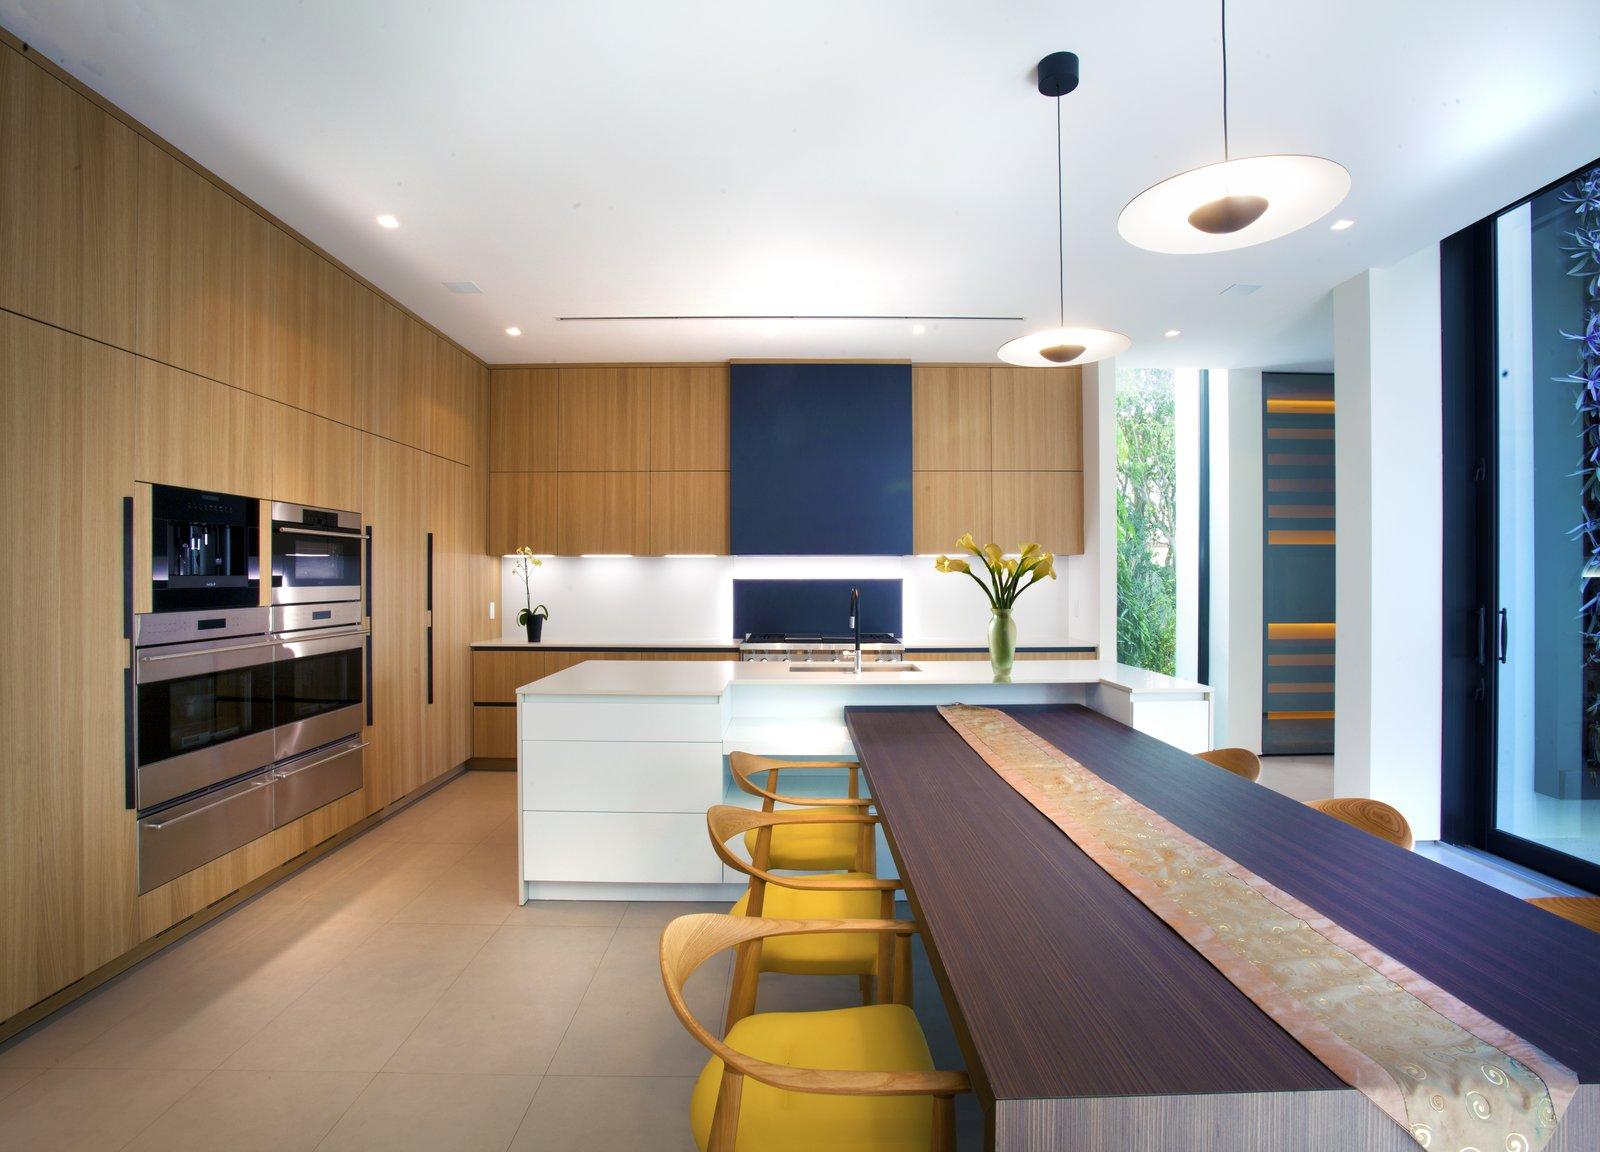 Kitchen  Allison Road Residence by Choeff Levy Fischman